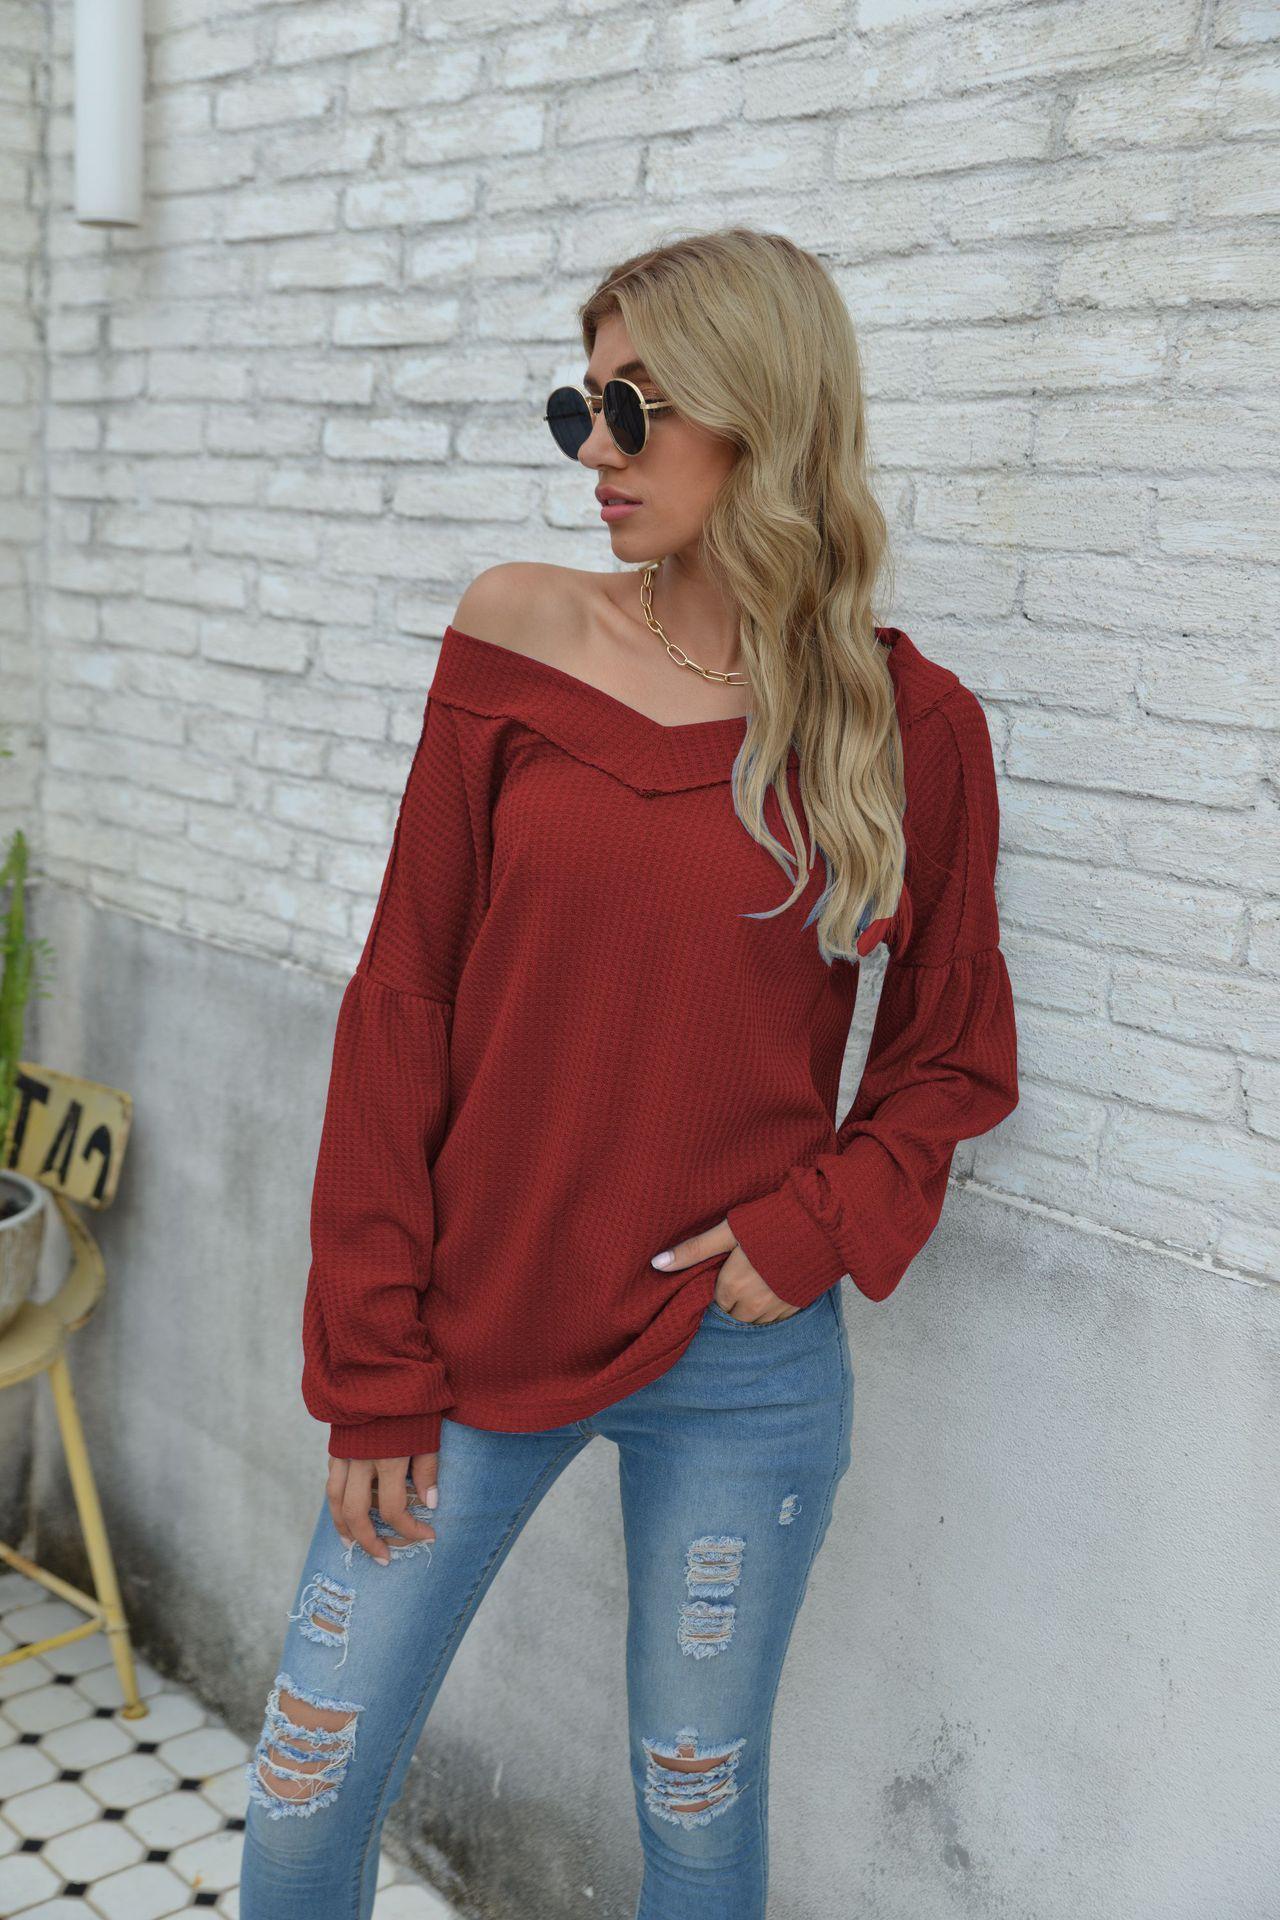 2020 Damen Herbst Mode Langarm V-Ausschnitt Top Sexy off Schulter Massive Farbe Hemden Für Damen Weiblich